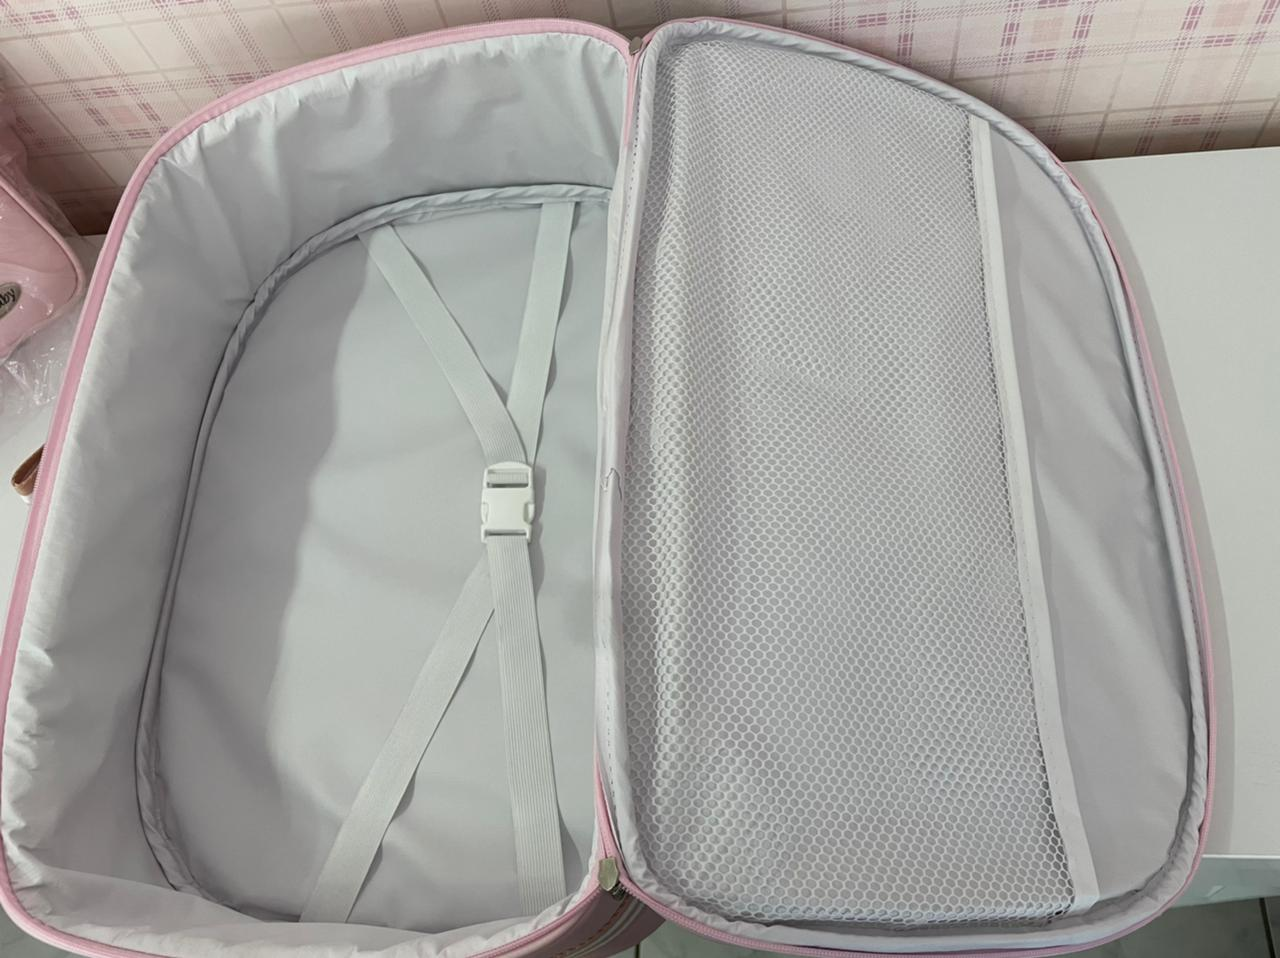 Kit de malas Premium Rosa